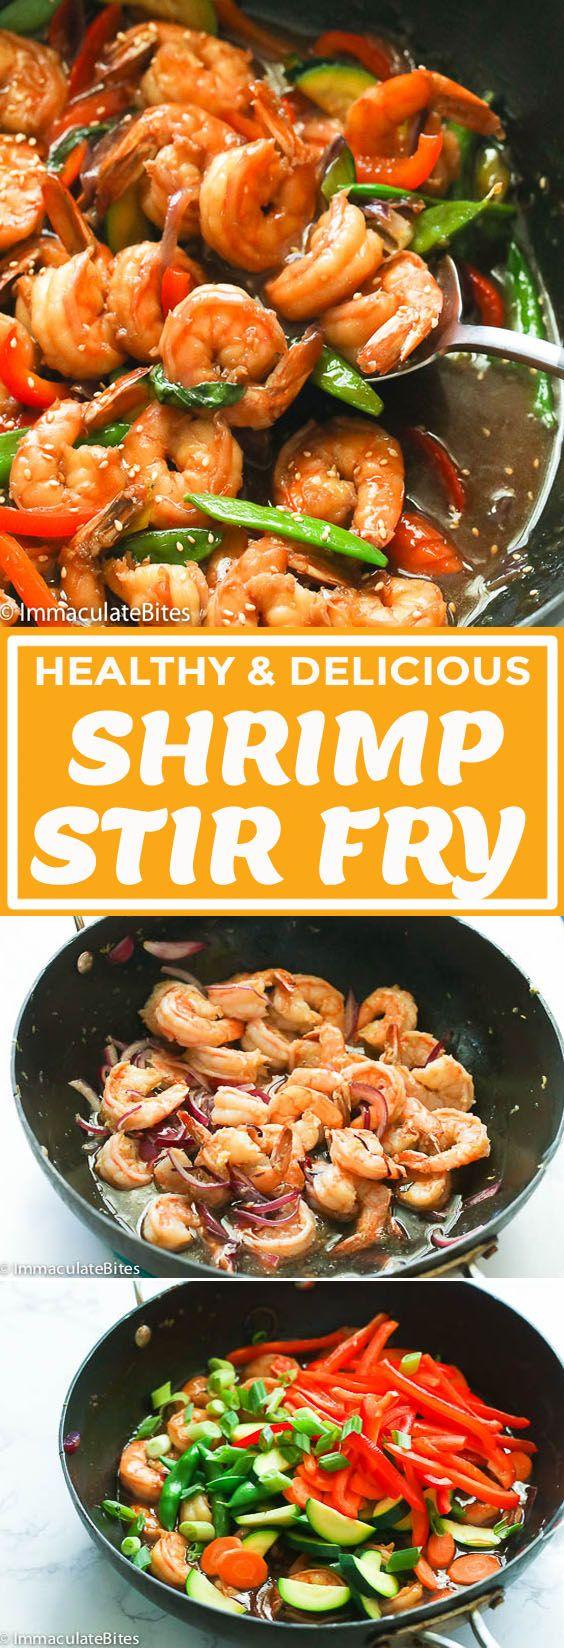 Shrimp Stir Fry #healthystirfry